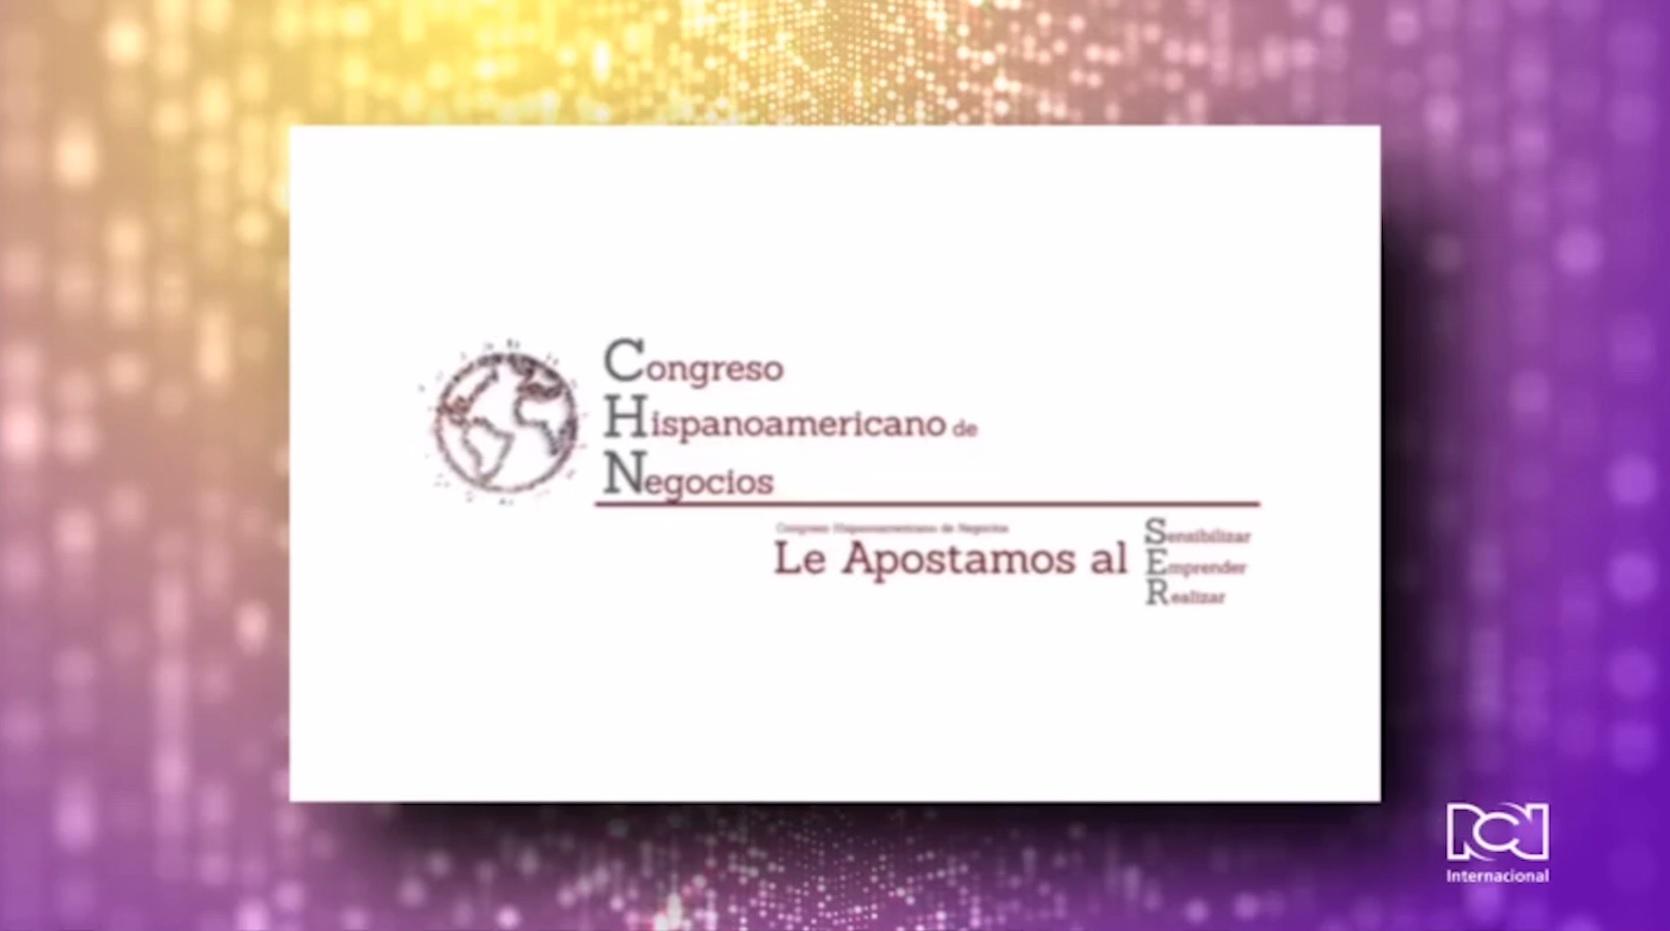 congreso-hispanoamericano-de-negocios.jpg